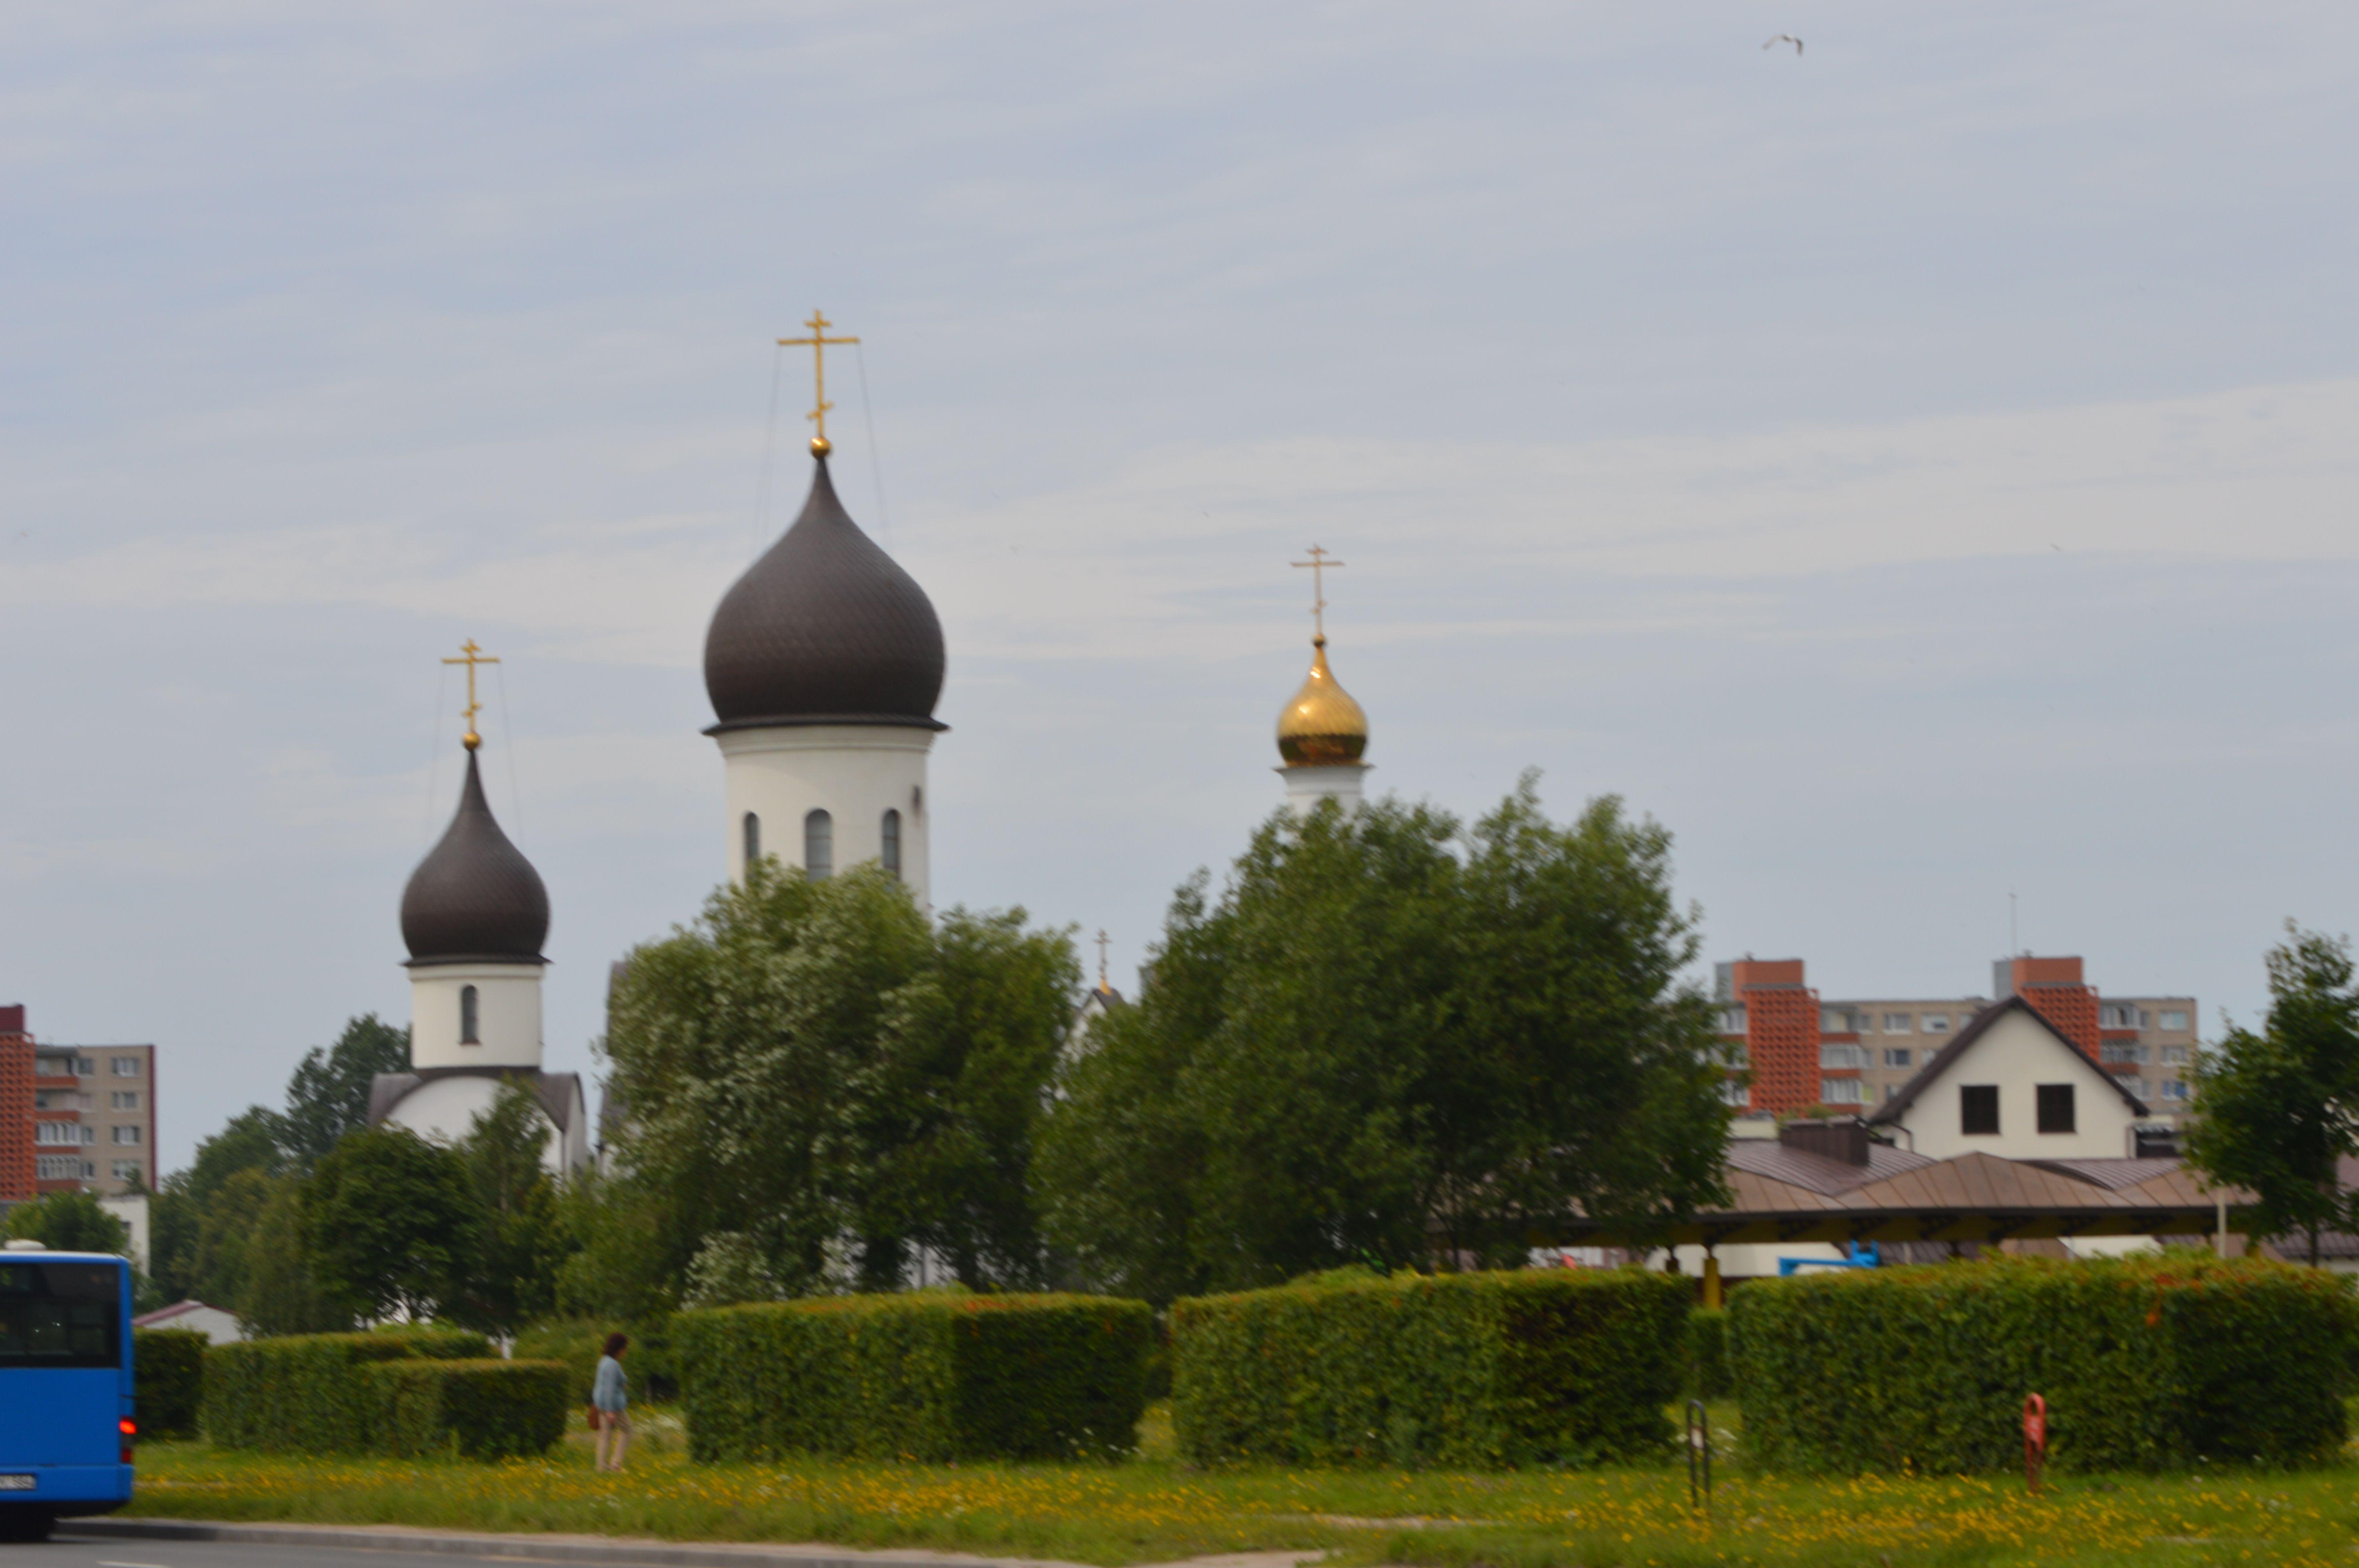 Проспект Смильтялес - Покрово - Никольский Храм - Клайпеда.